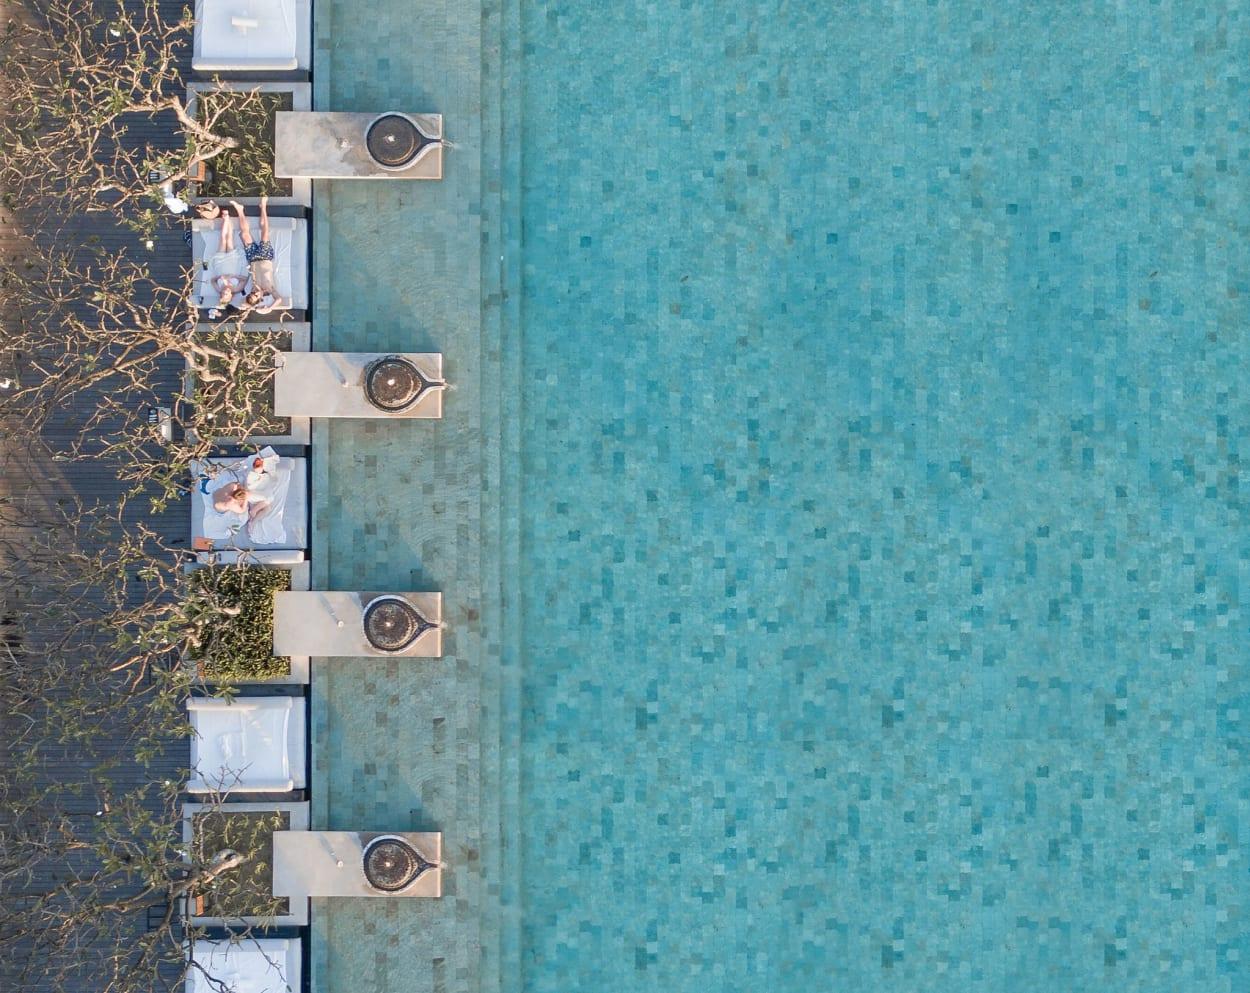 Brad Walls, Bradscanvas, Pools from above, Fotografie